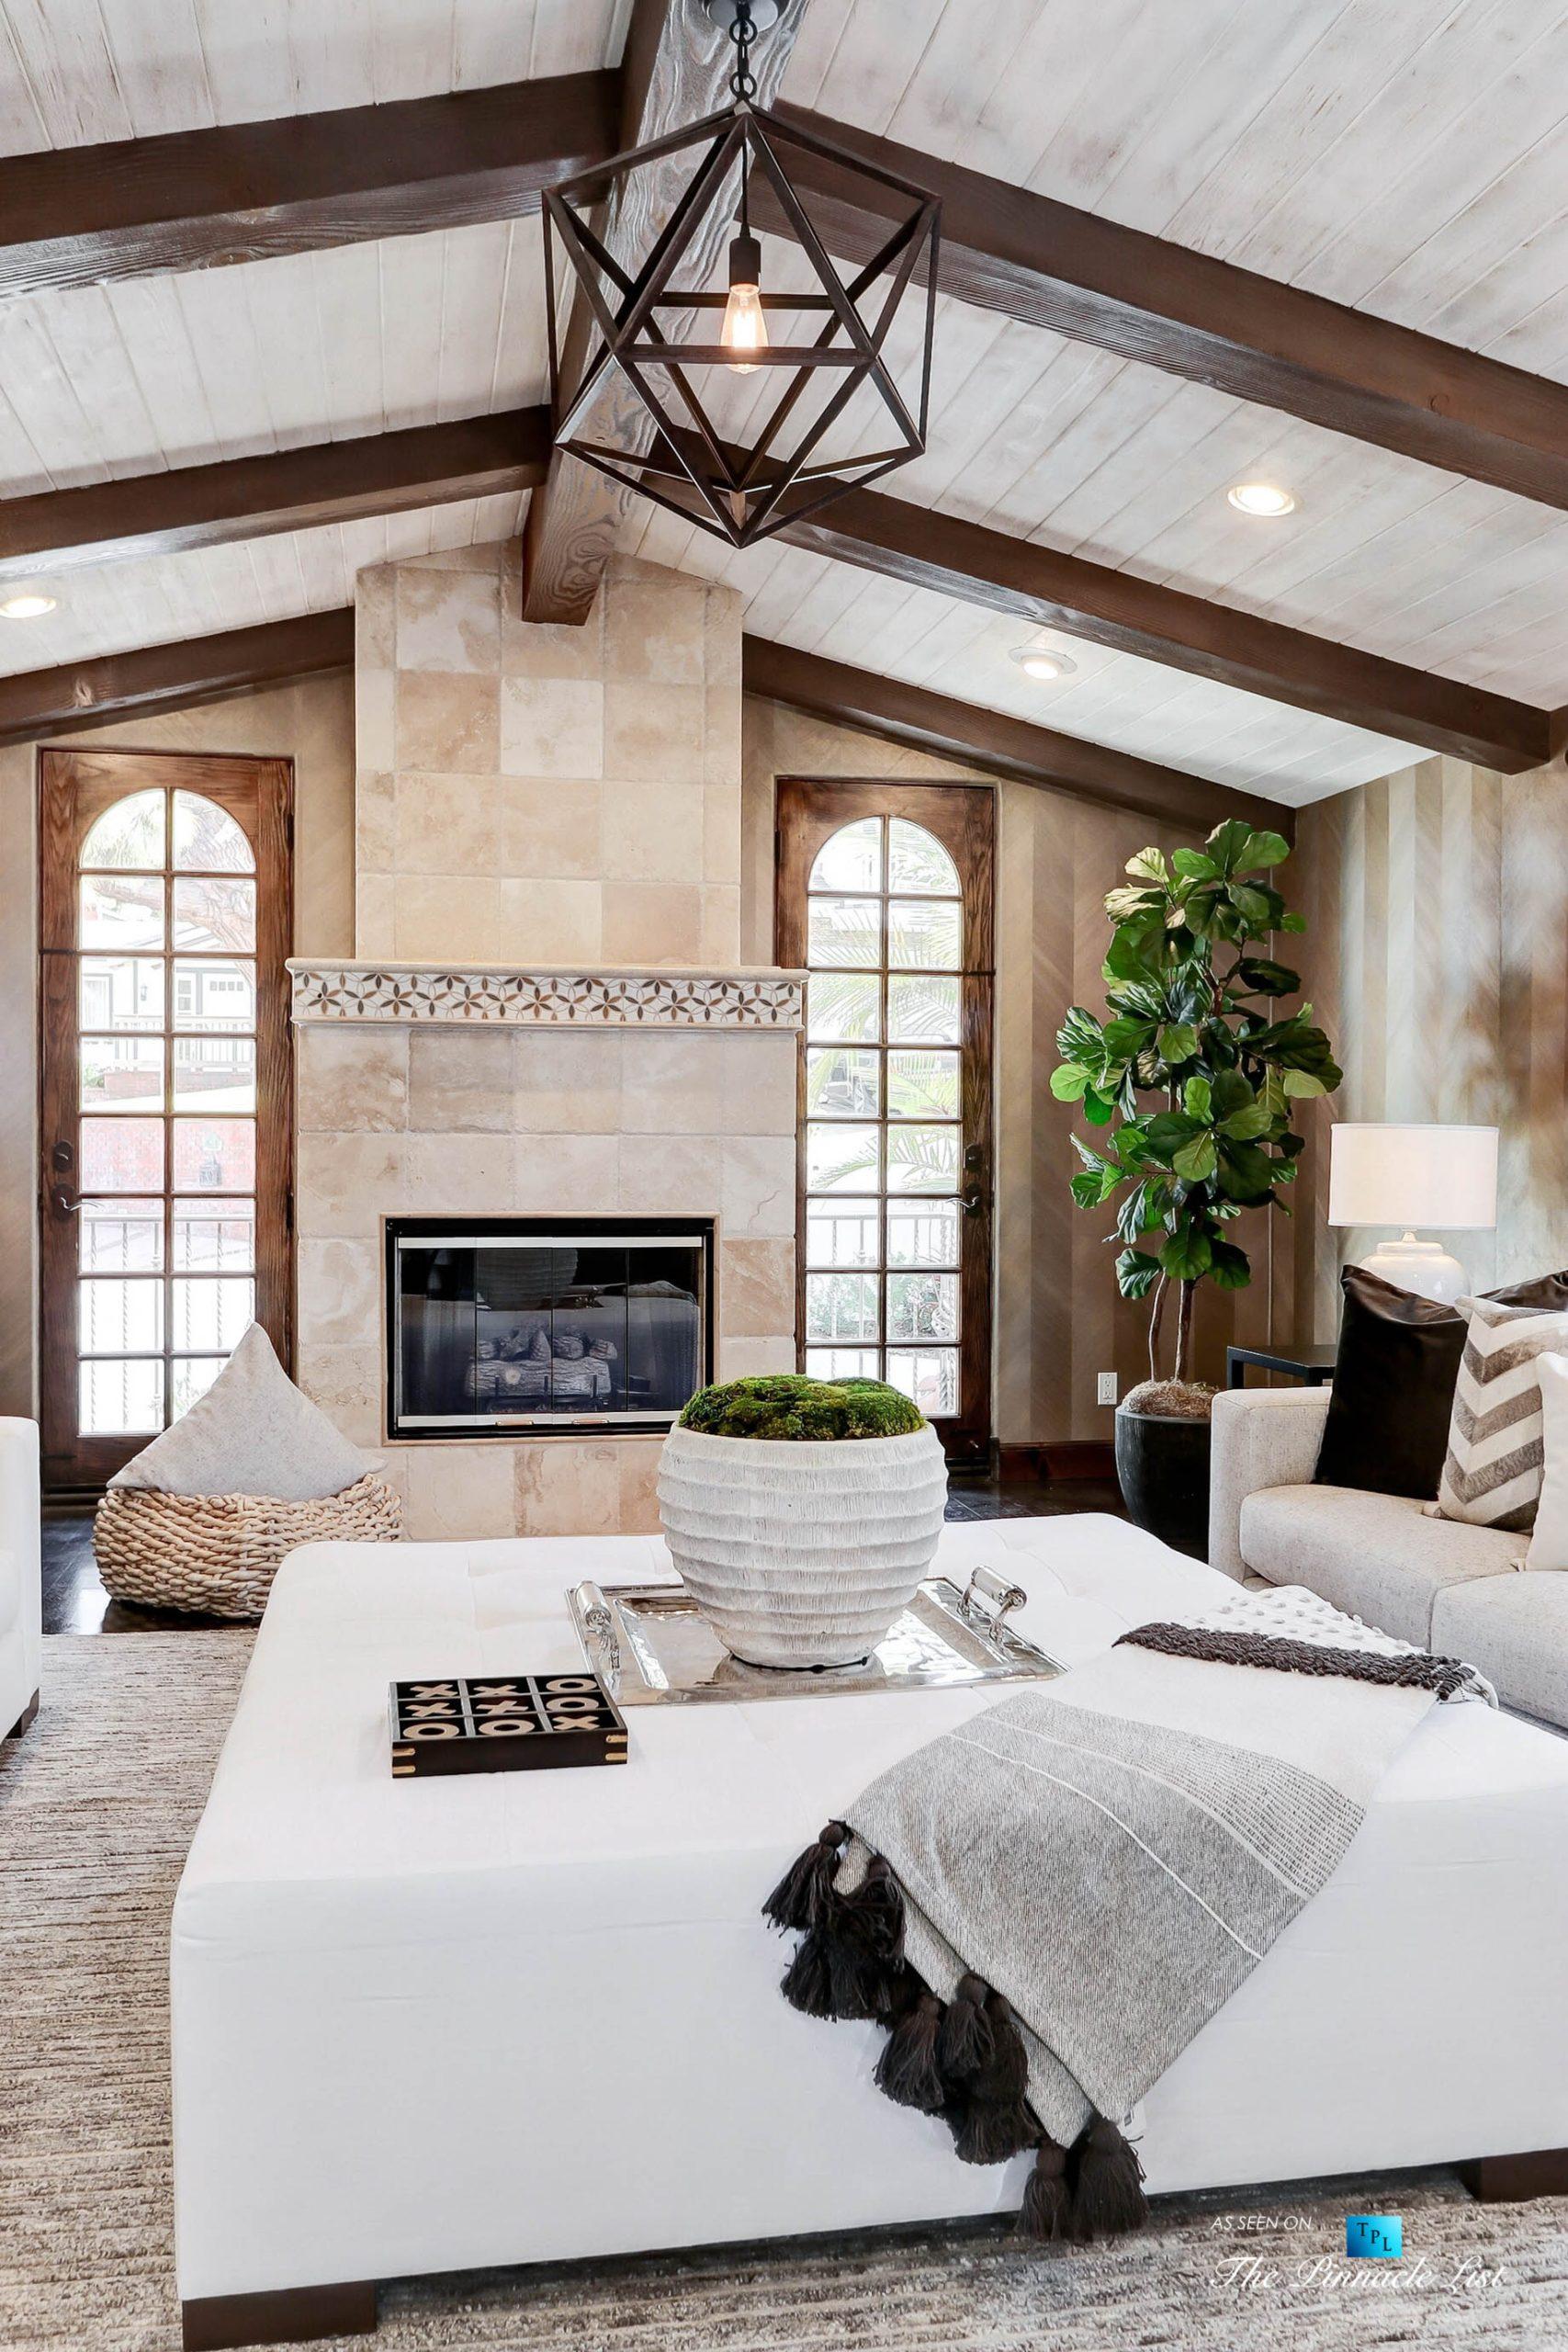 853 10th Street, Manhattan Beach, CA, USA - Family Room Fireplace